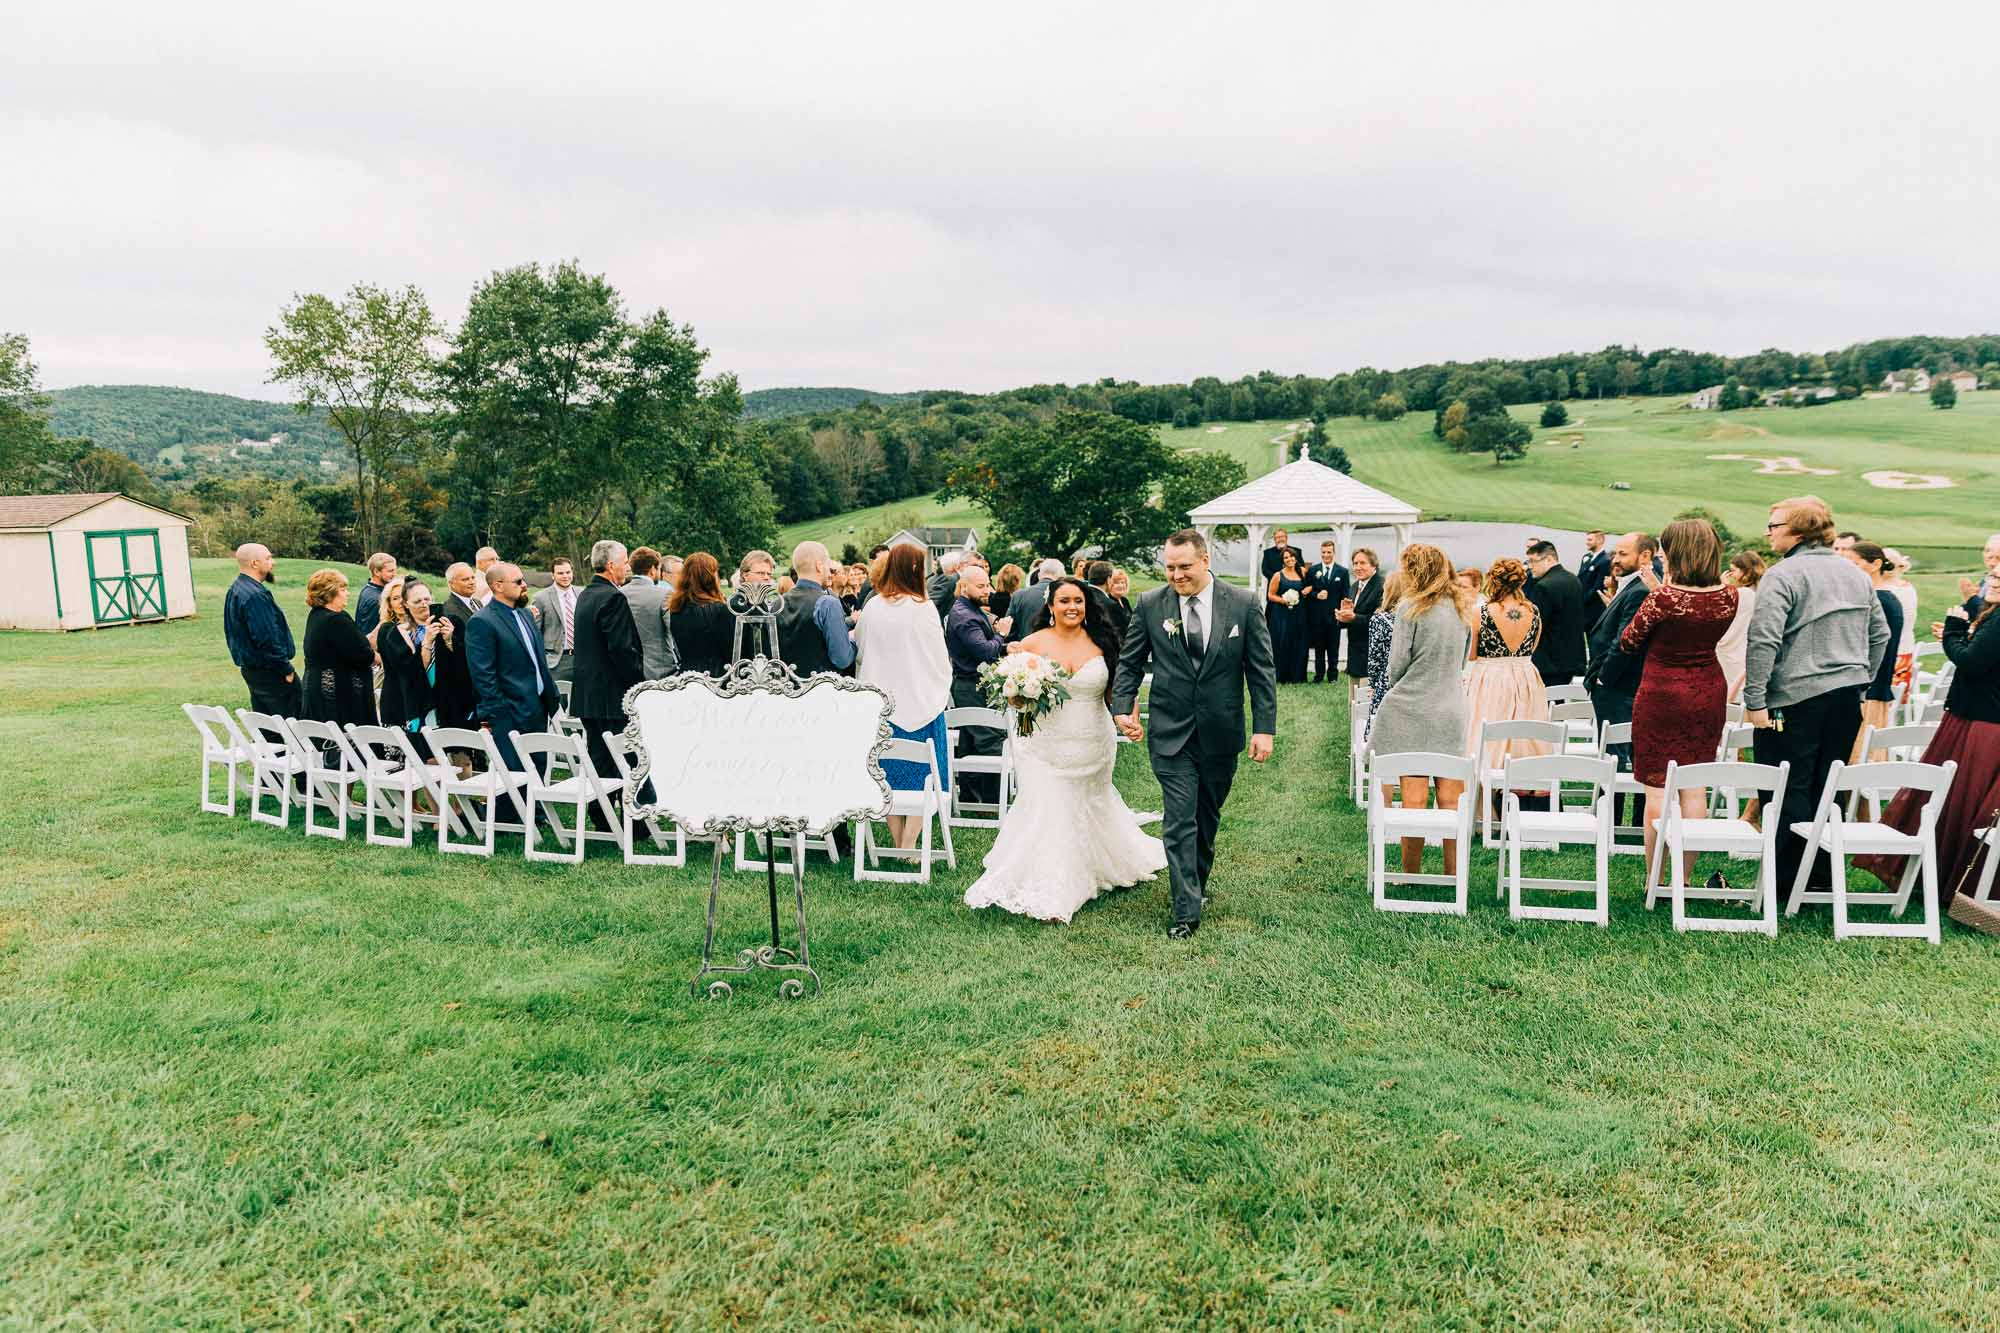 stonhedge-country-club-wedding-3077.jpg